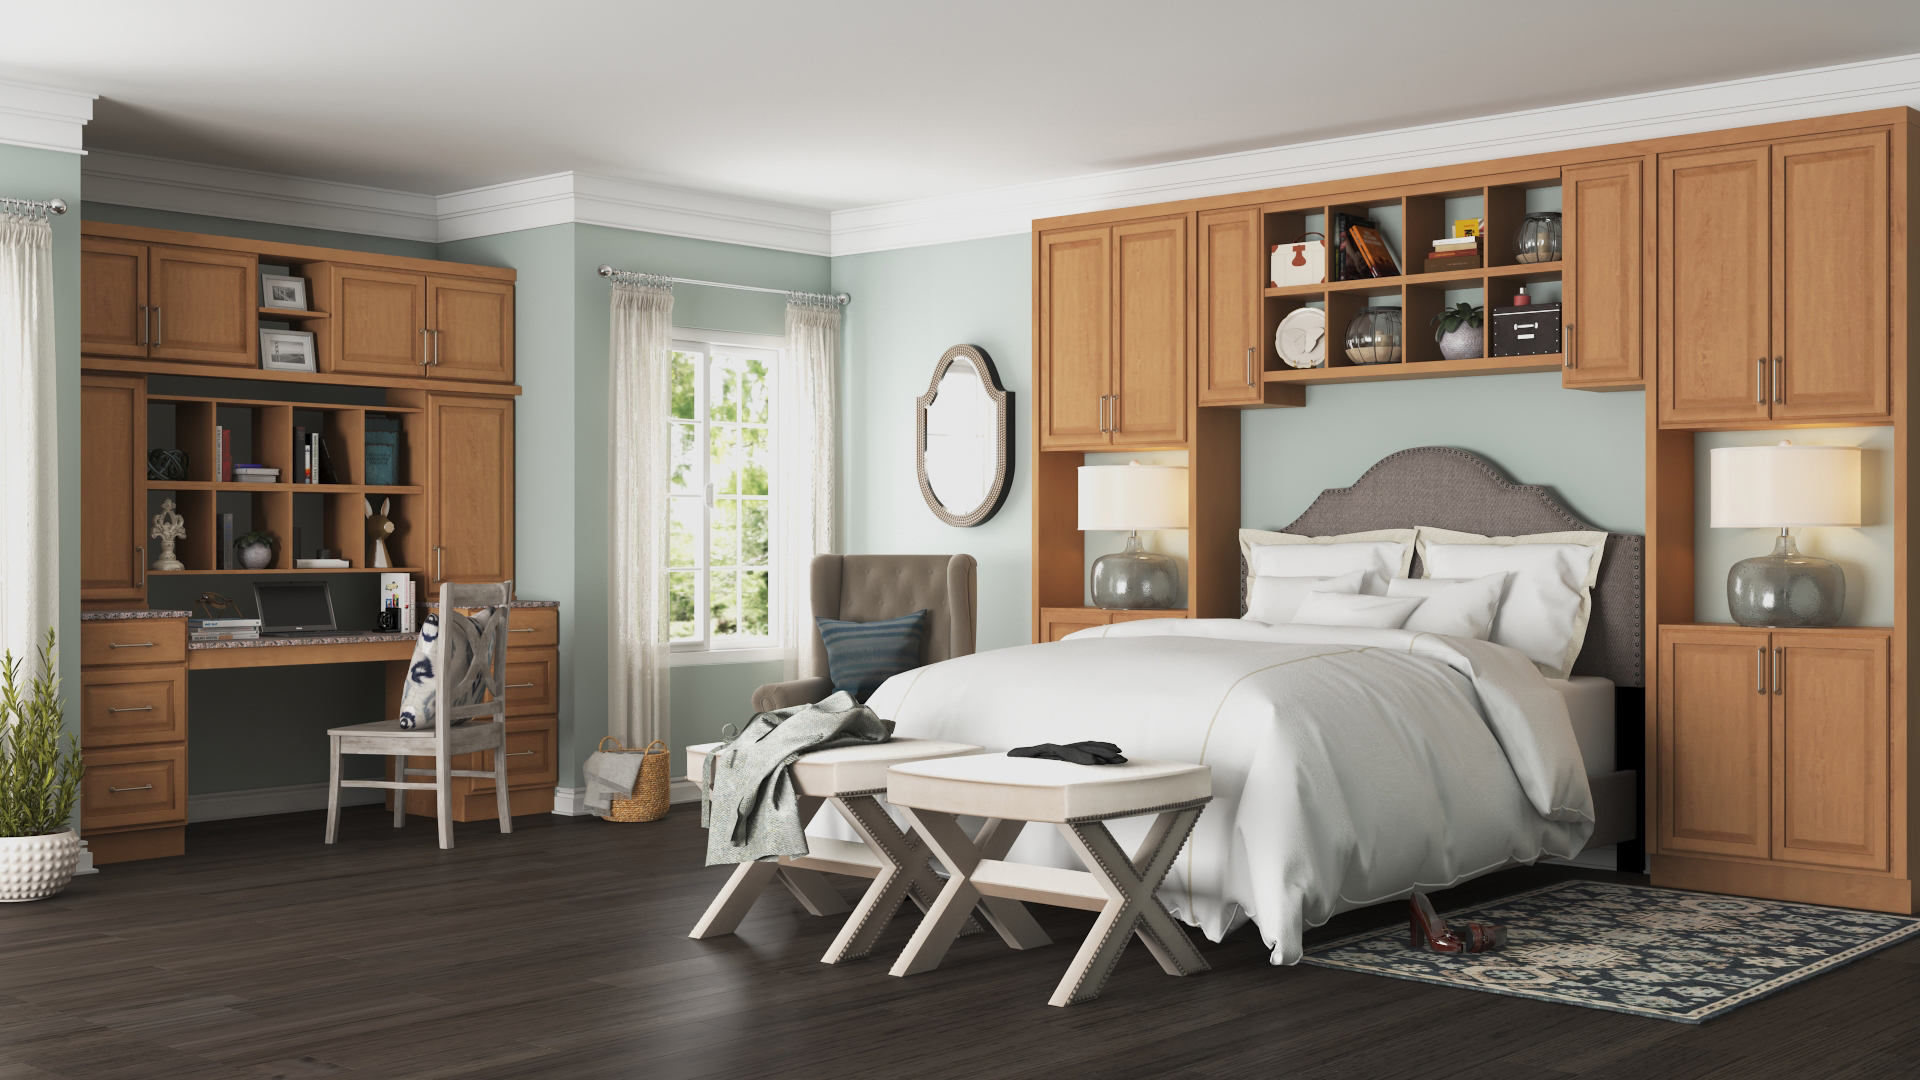 Hampton Wall Kitchen Cabinets in Medium Oak - Kitchen ...